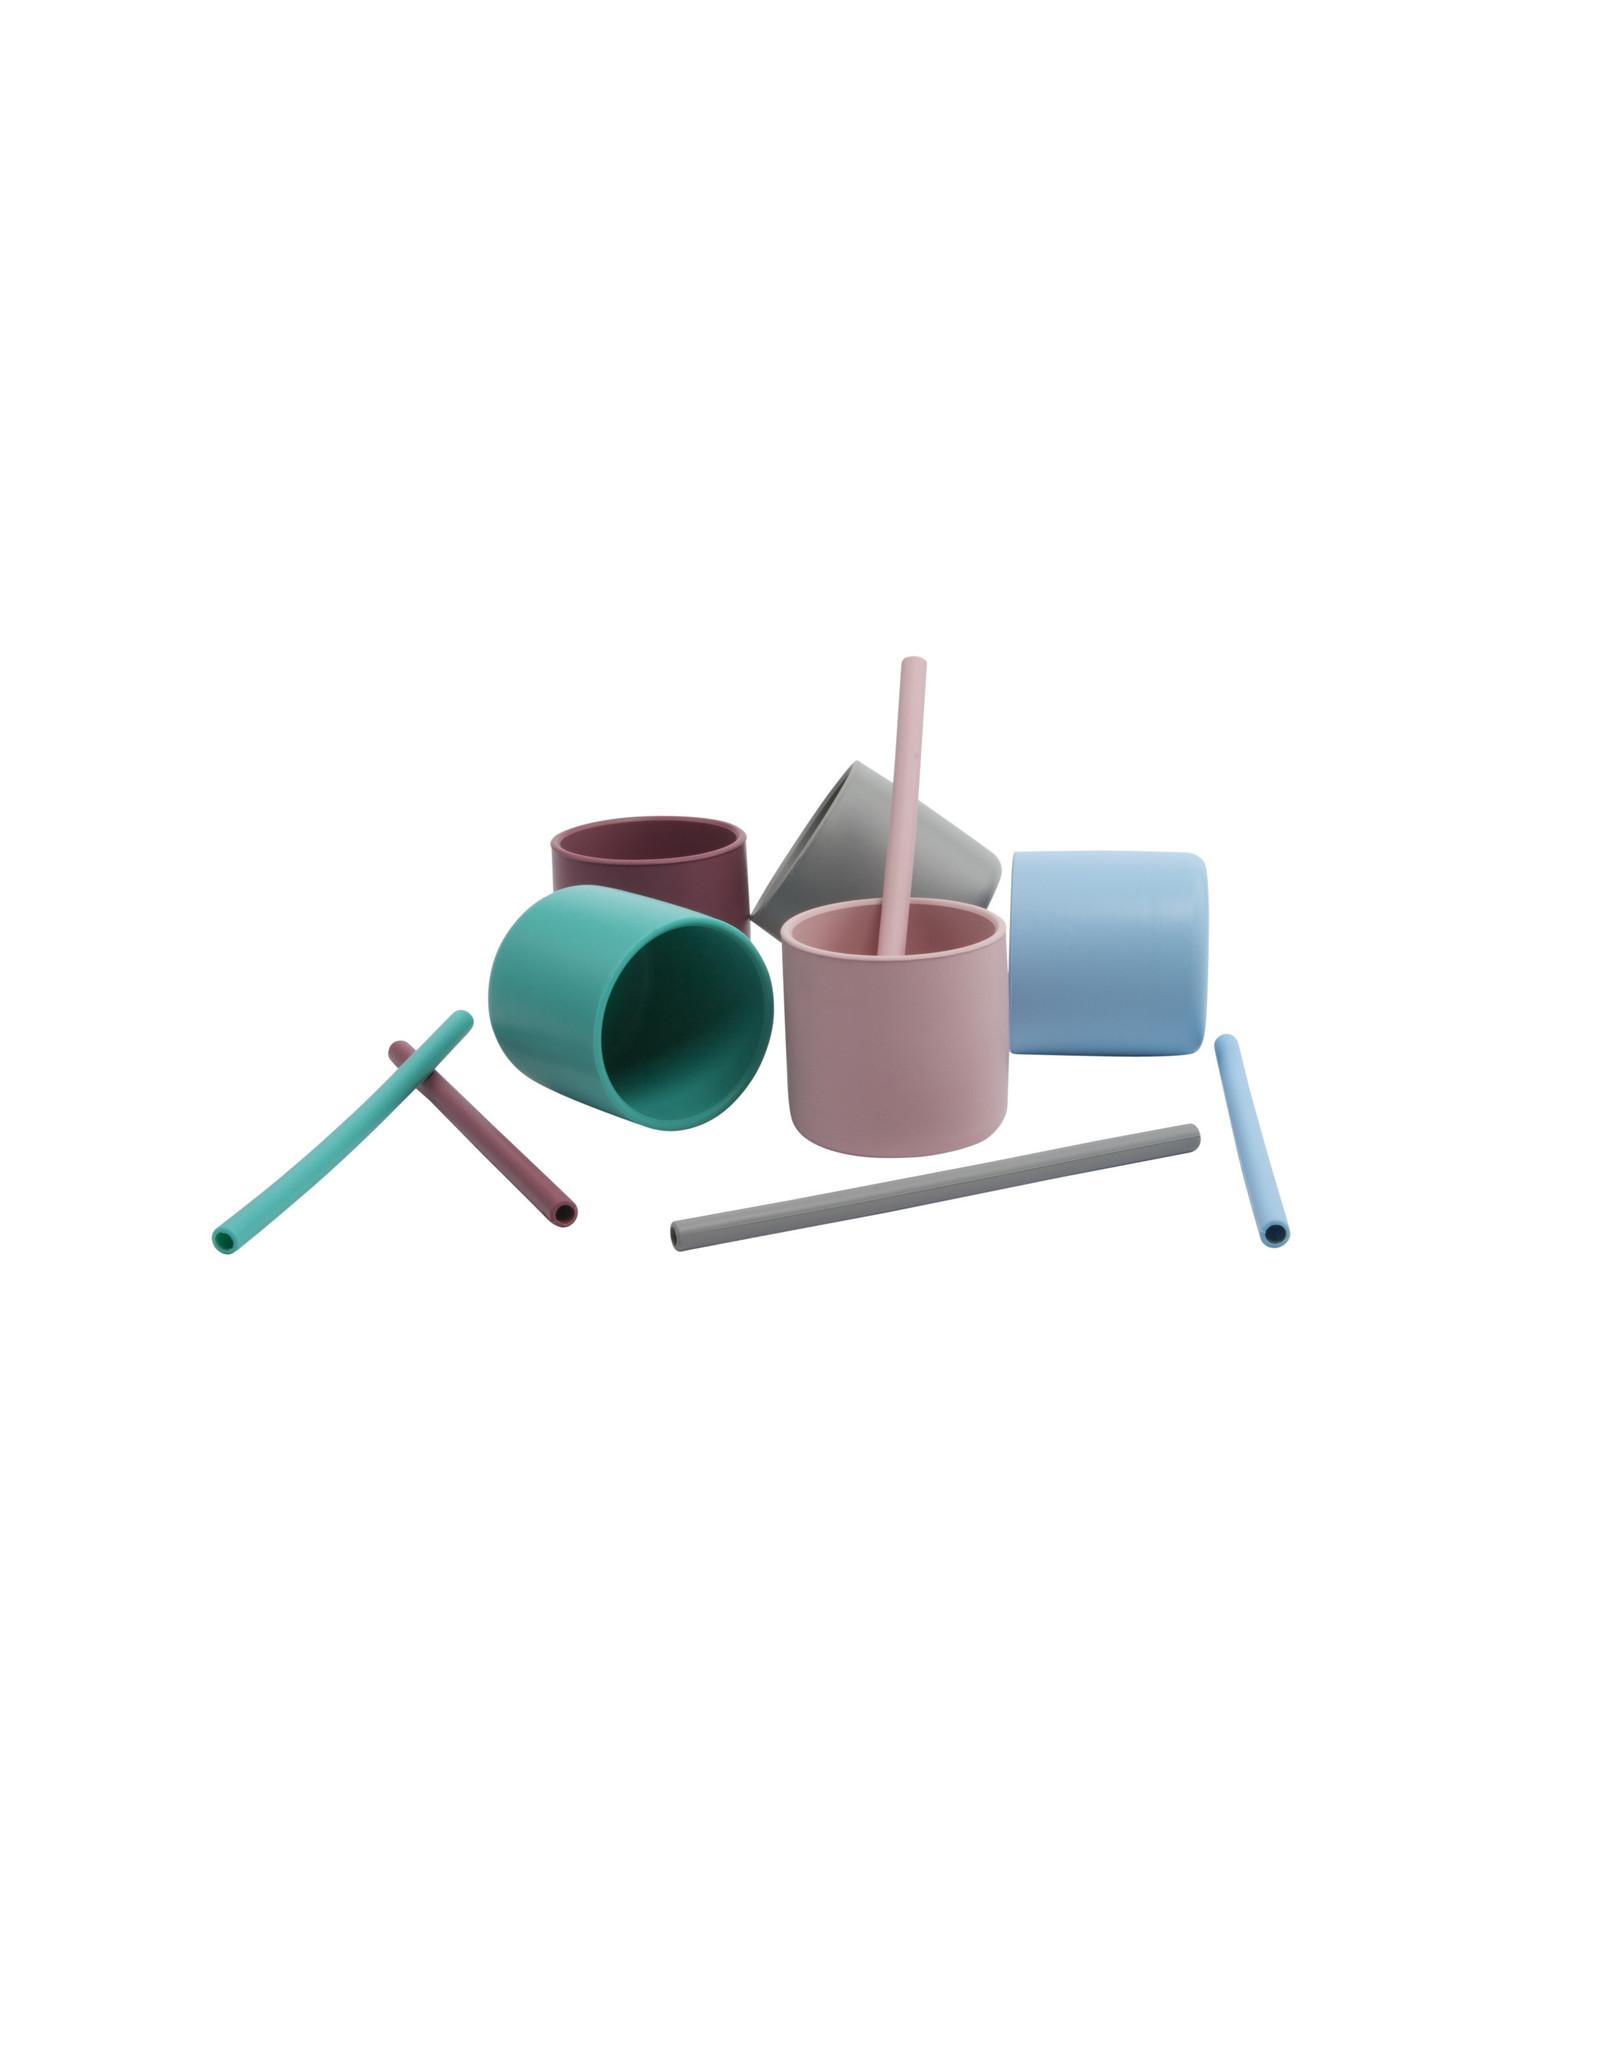 MiniKOiOi Minikoioi Rietje Mix Groen, Grijs, Donkerroze & Roze